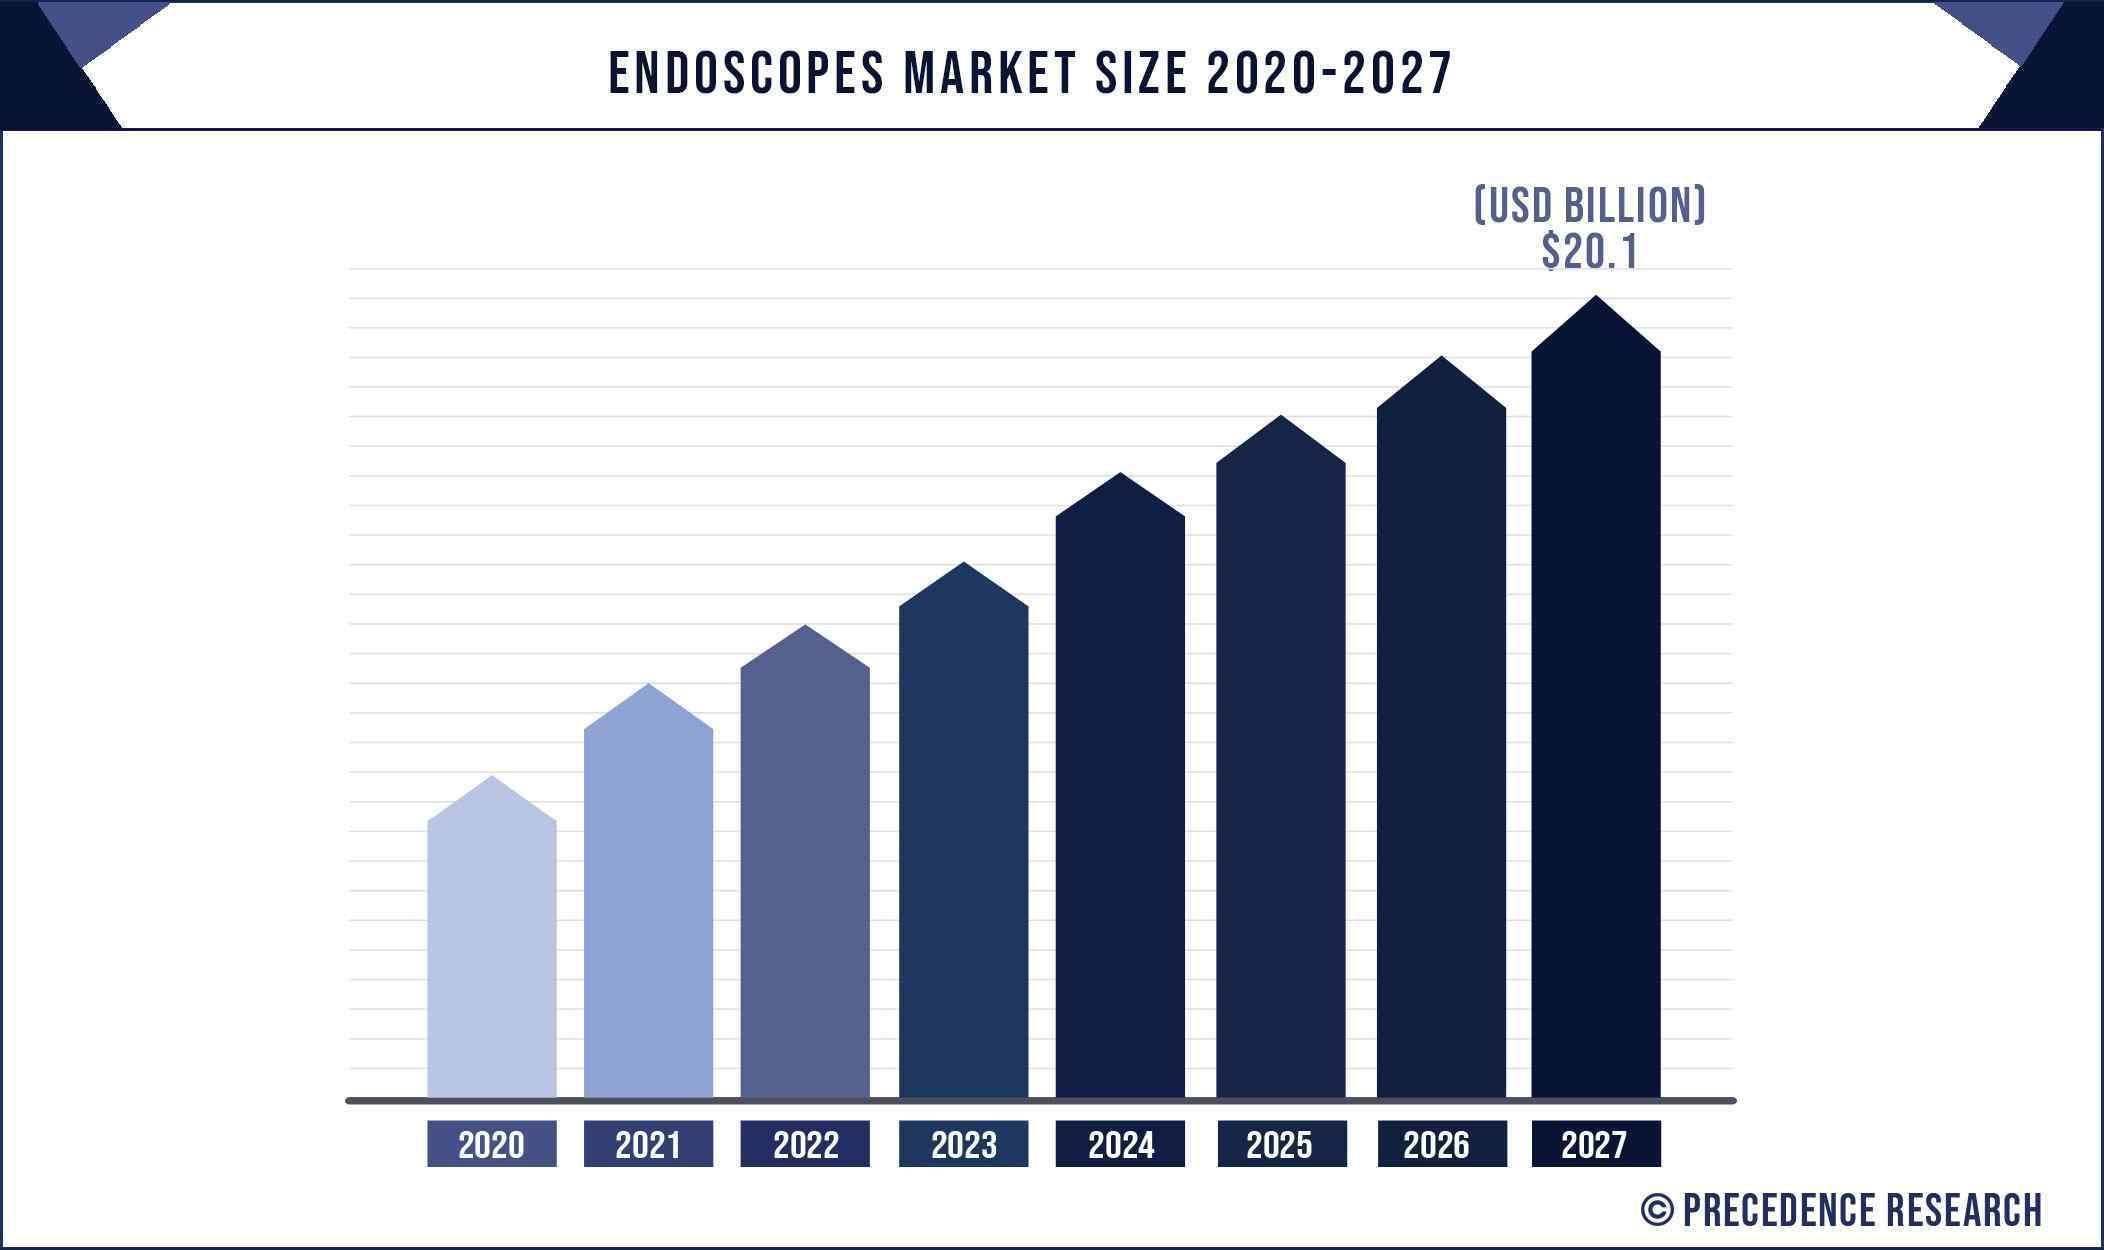 Endoscopes Market Size 2020 to 2027